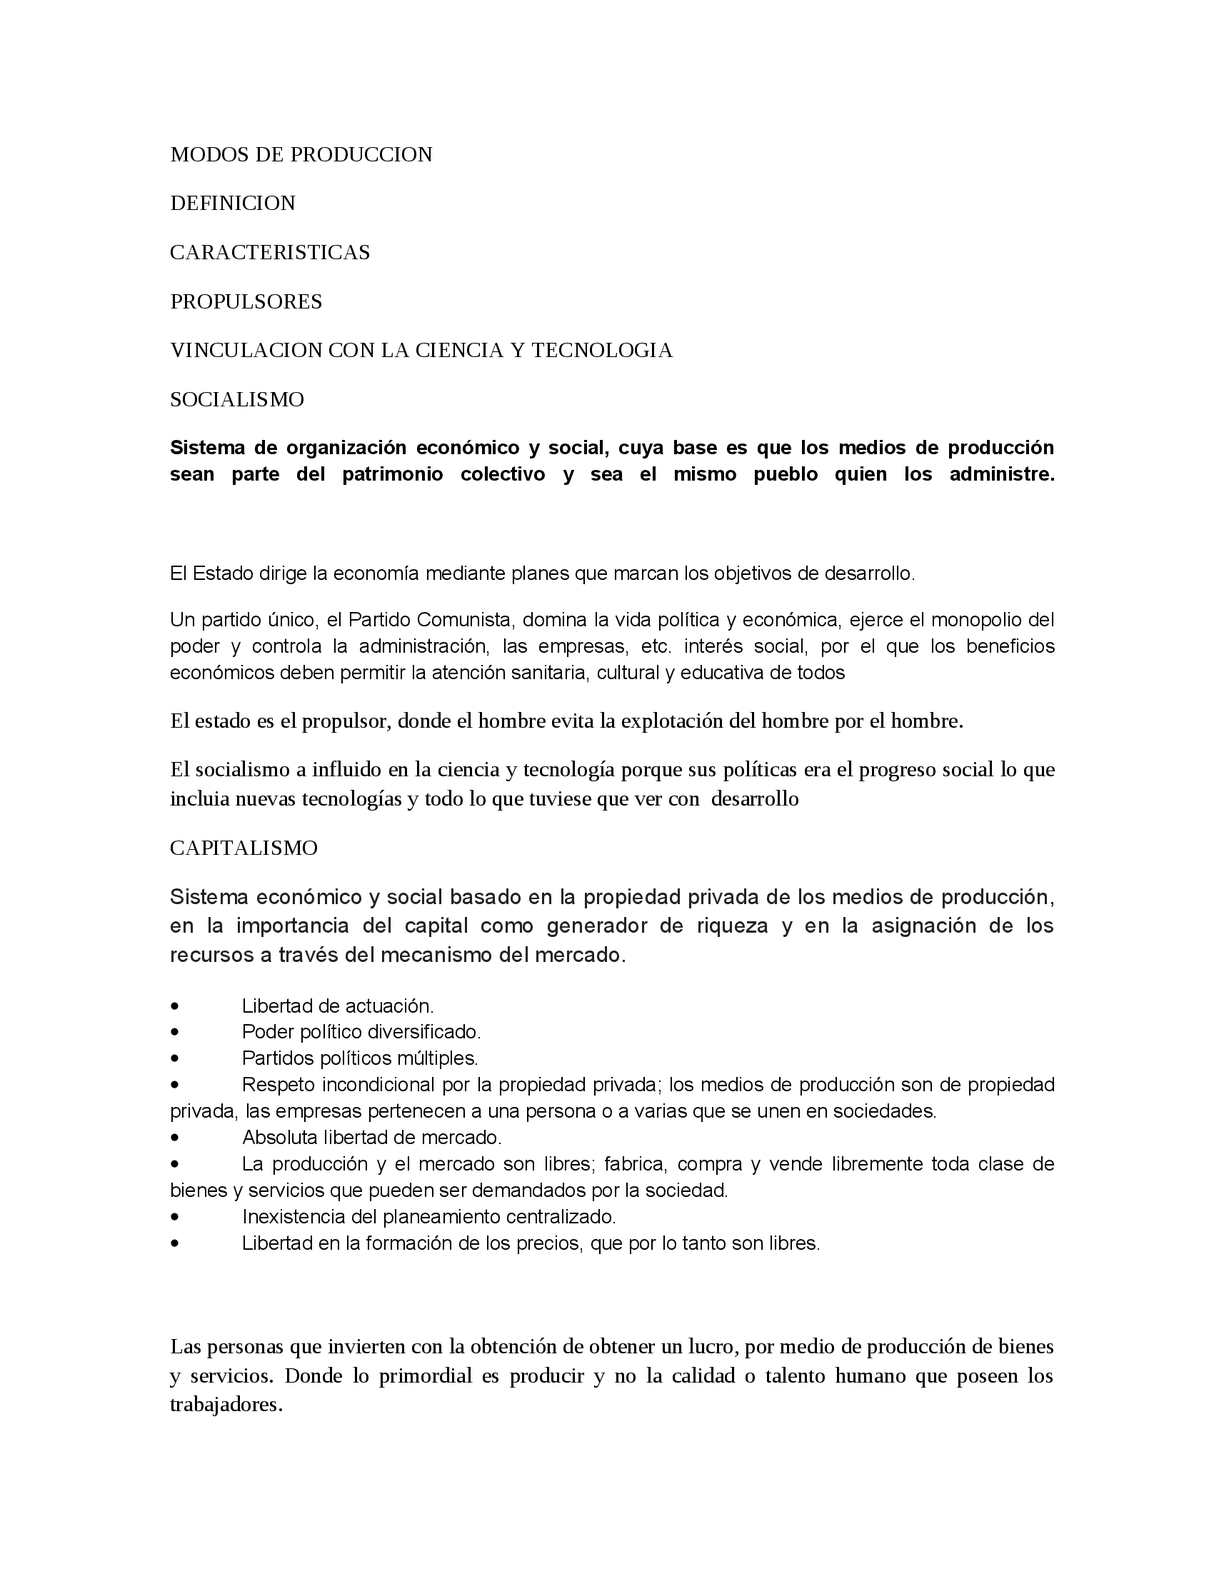 Calaméo - Cuadro Comparativo MODOS DE PRODUCCION